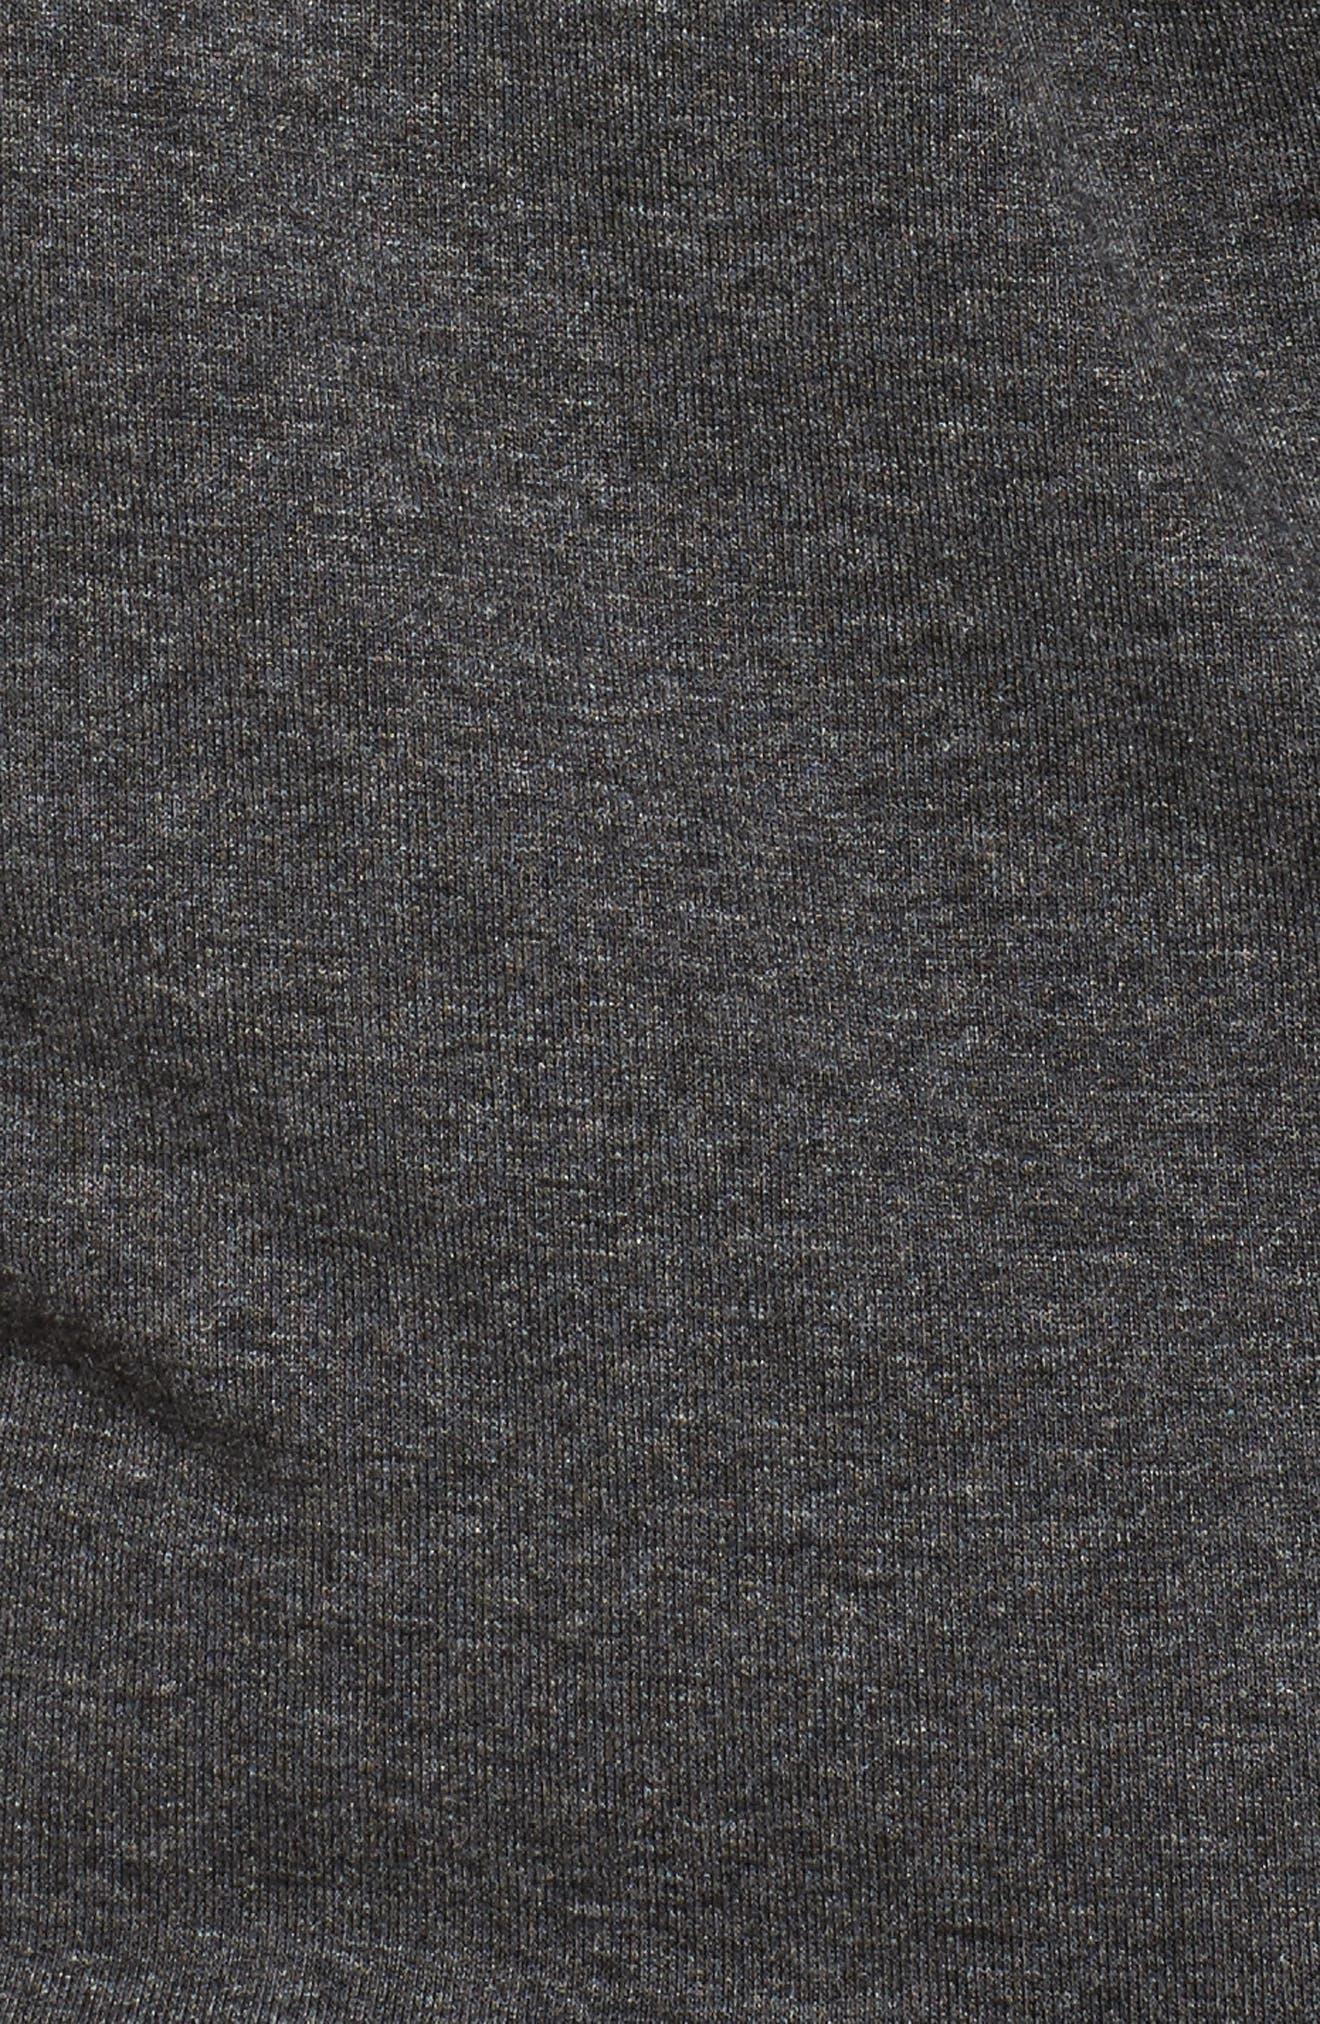 Slit Sleeve Knit Sheath Dress,                             Alternate thumbnail 5, color,                             Medium Heather Grey